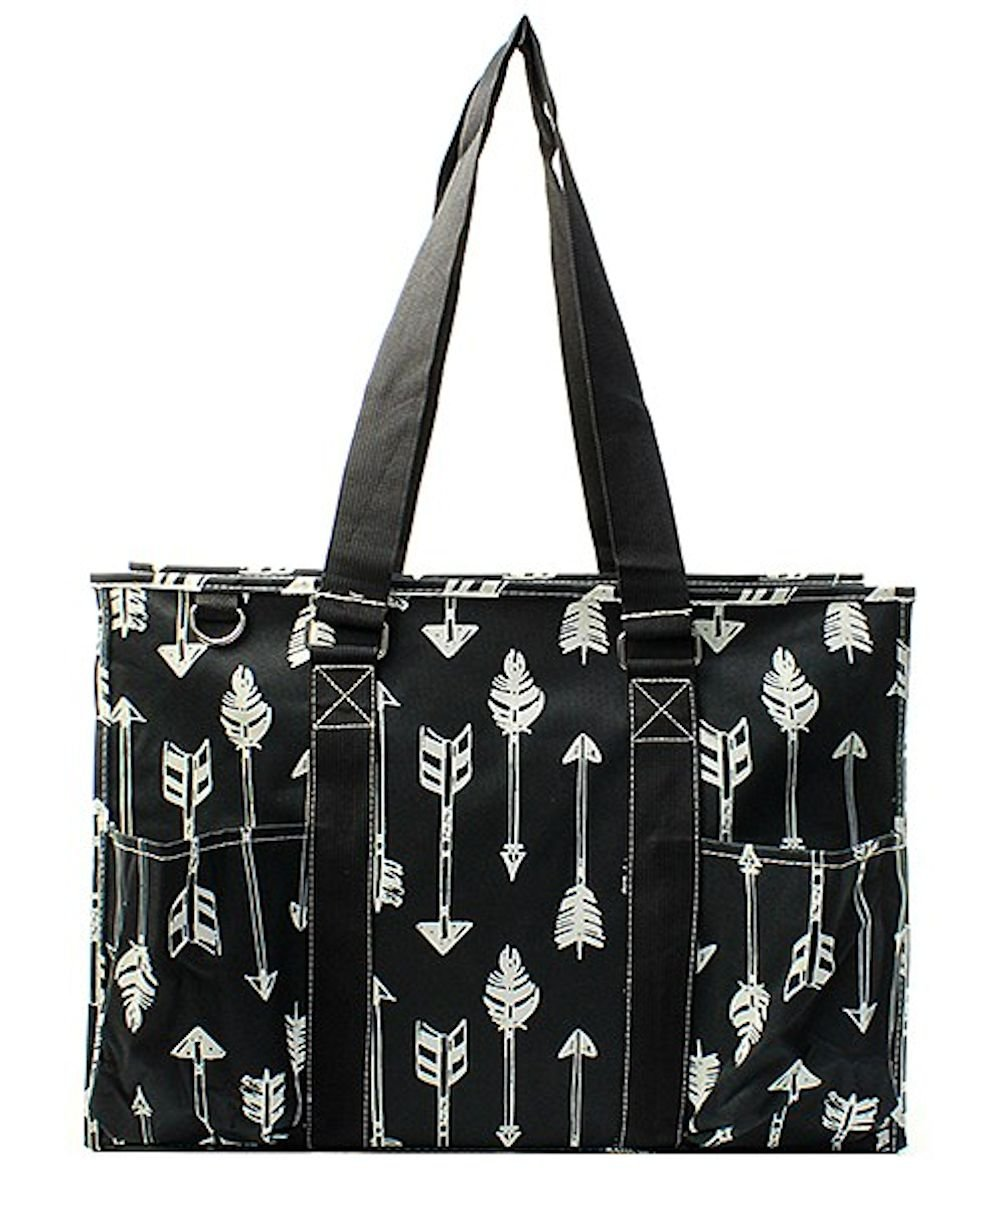 N. Gil All Purpose Organizer 18'' Large Utility Tote Bag 2 (Arrow Black)